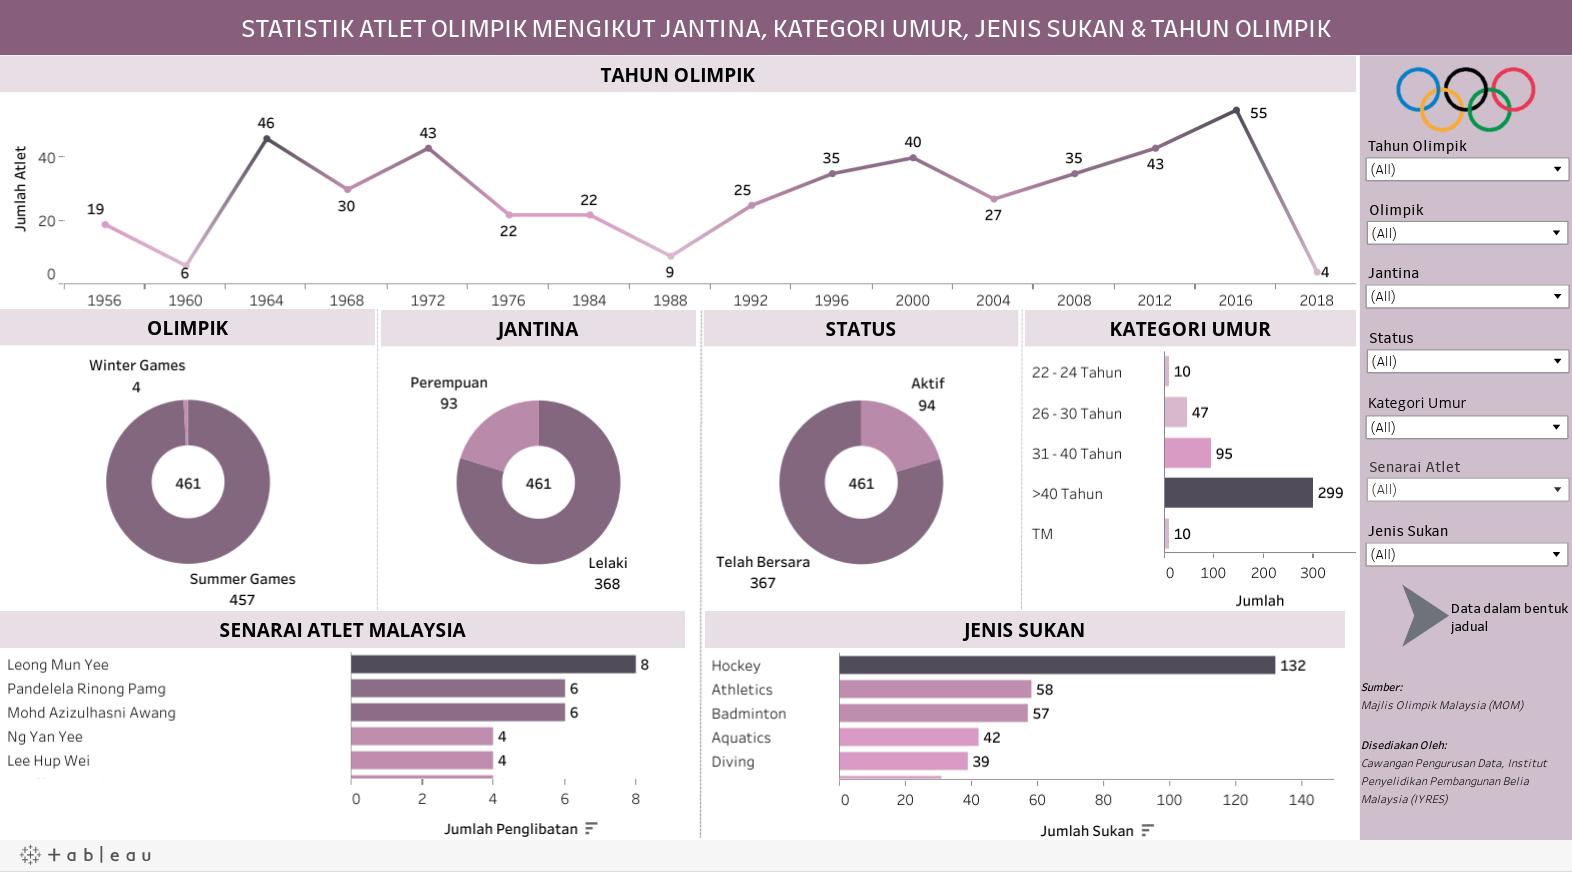 STATISTIK ATLET OLIMPIK MENGIKUT JANTINA, KATEGORI UMUR, JENIS SUKAN & TAHUN OLIMPIK